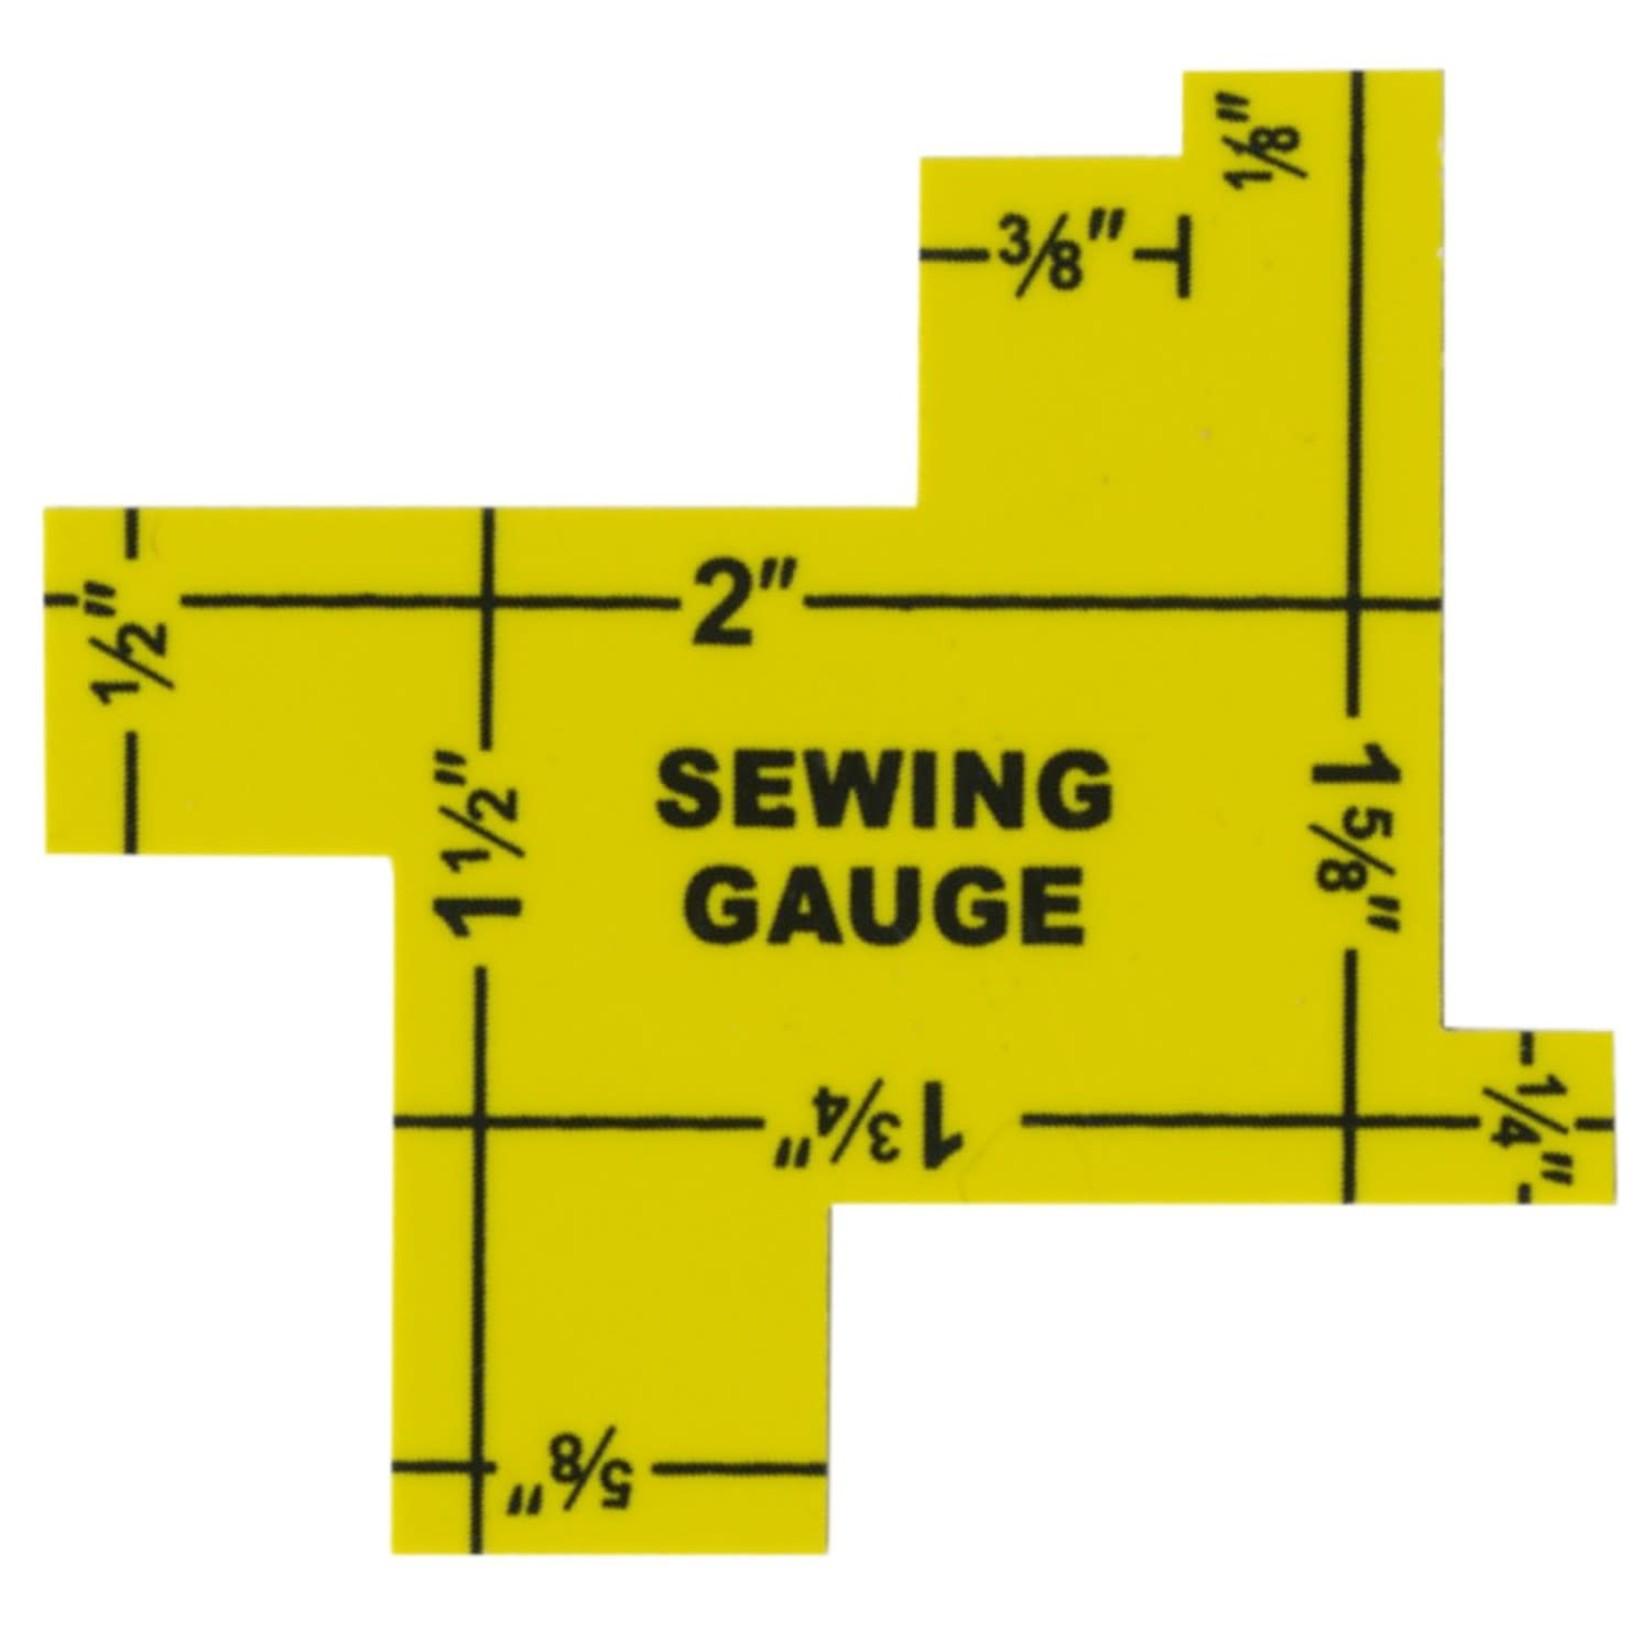 SEW MATE Mini Sewing Gauge